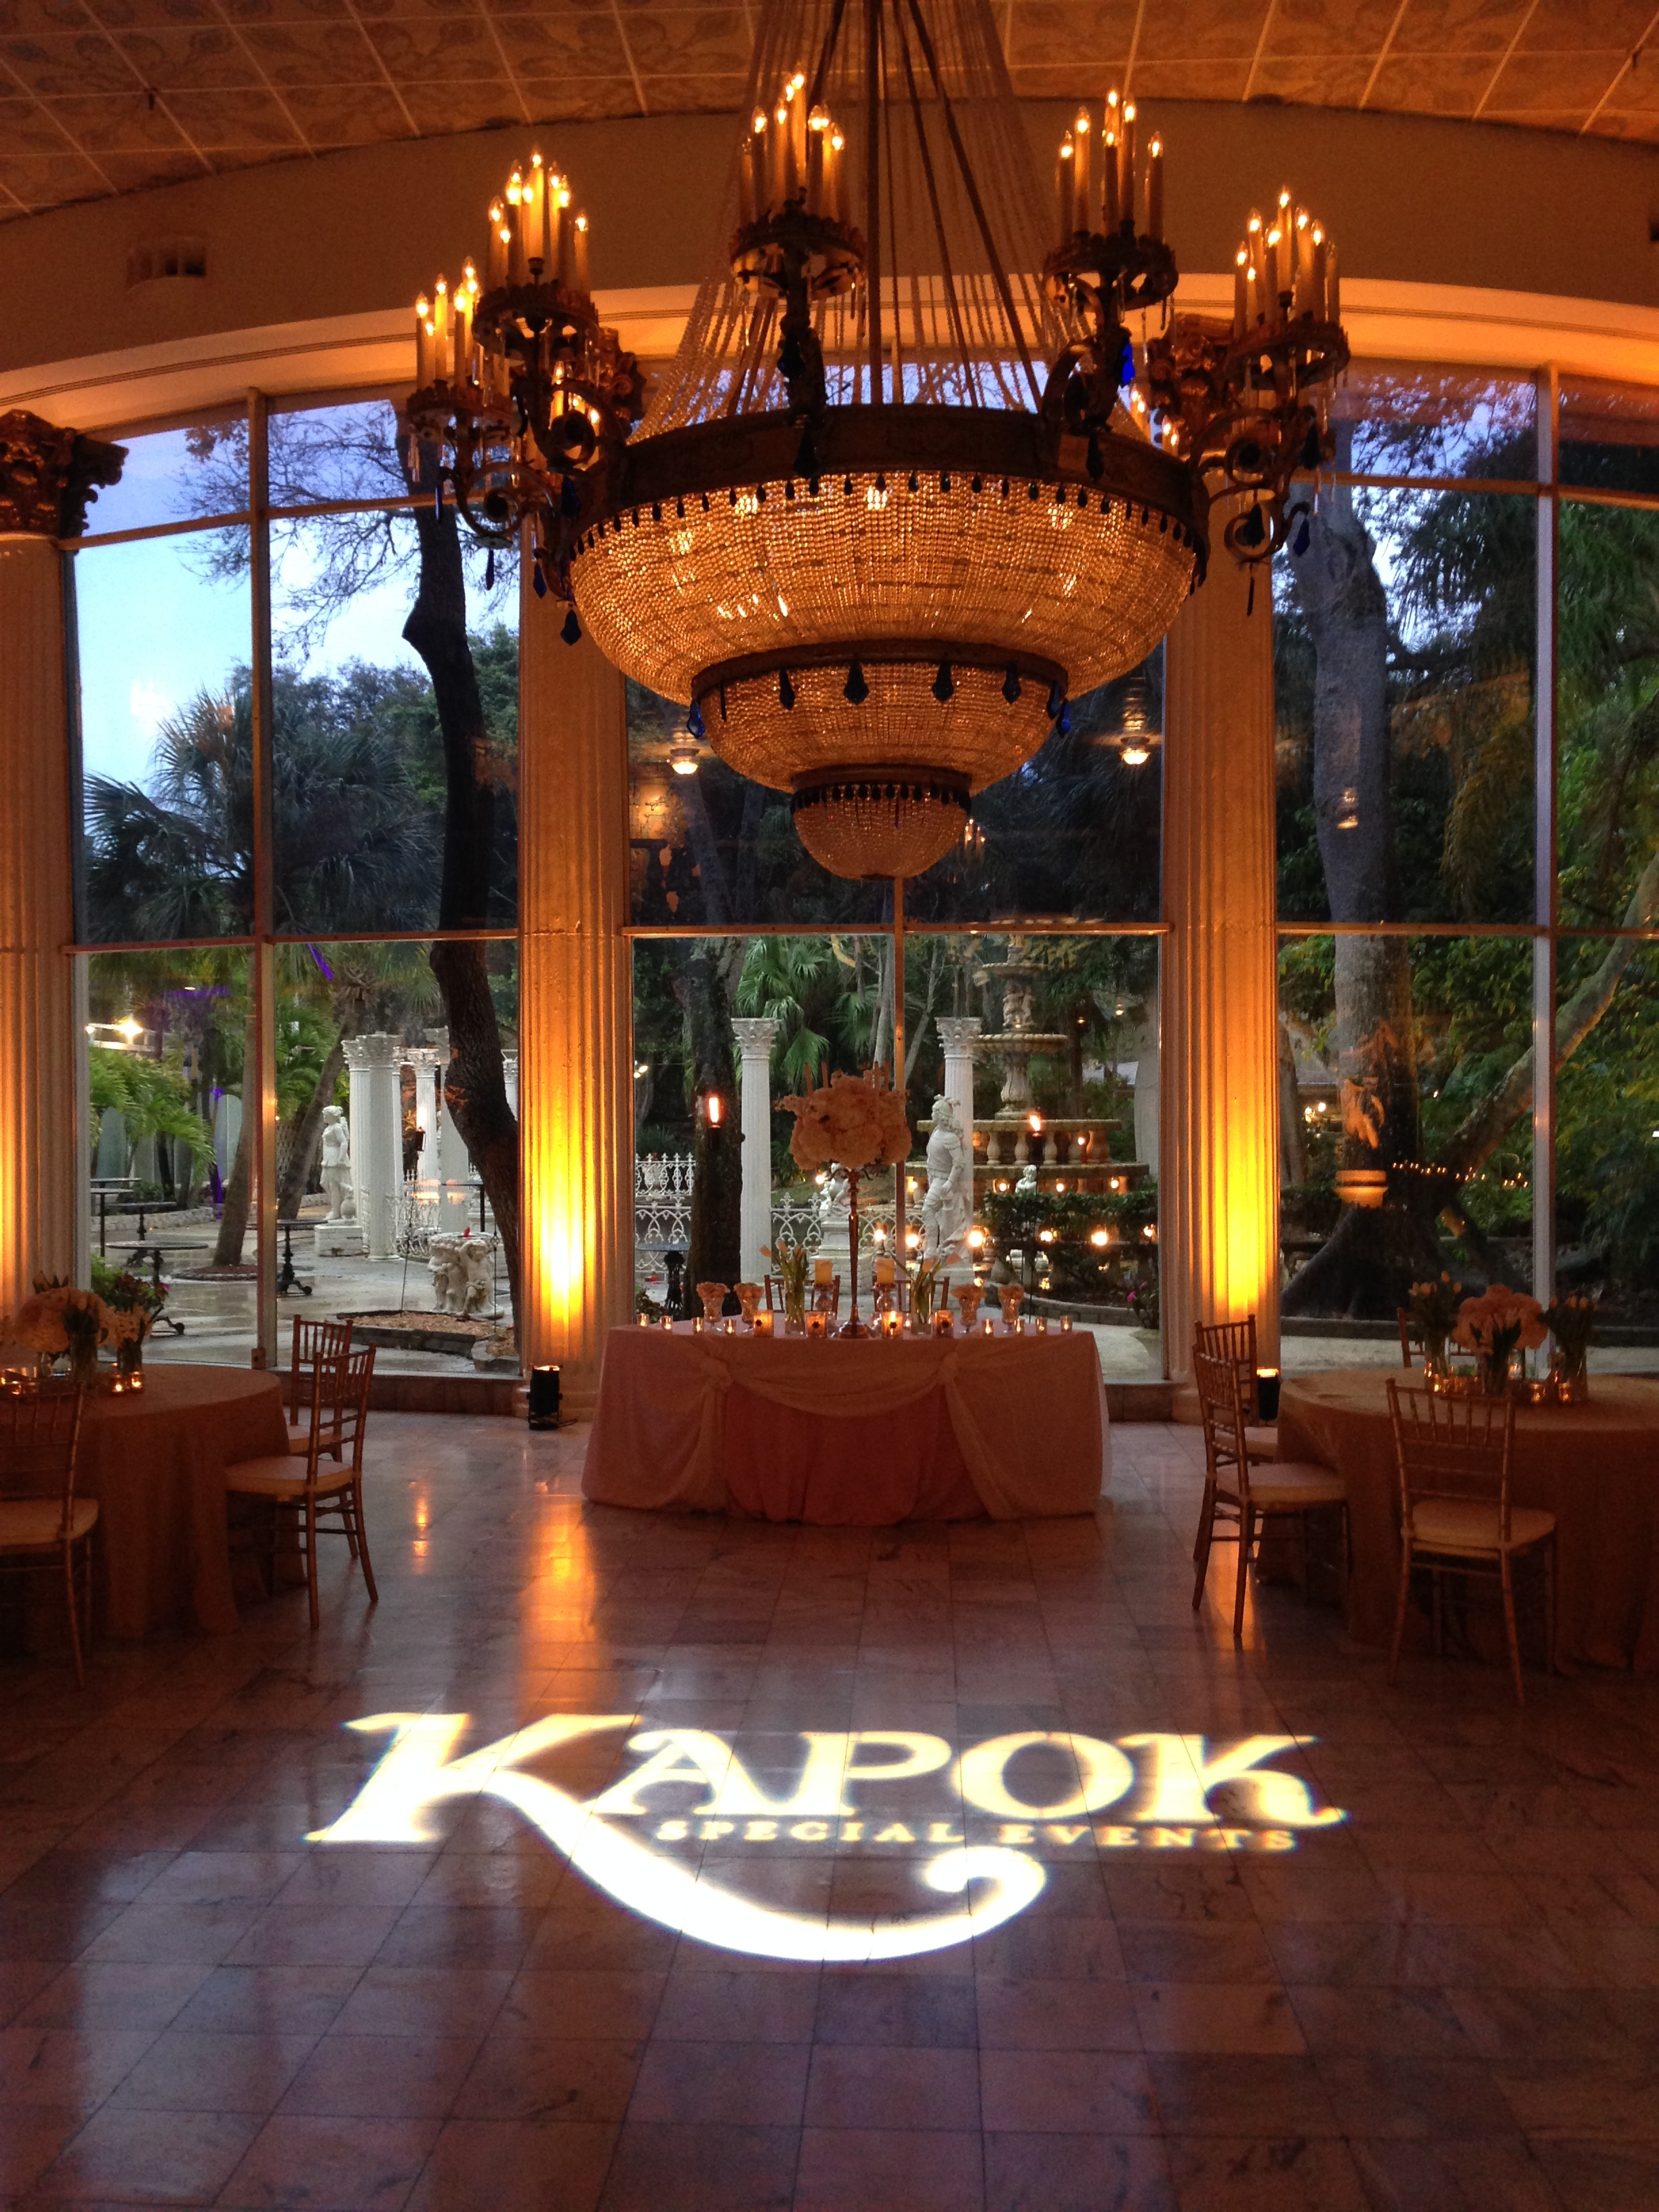 Kapok Special Events